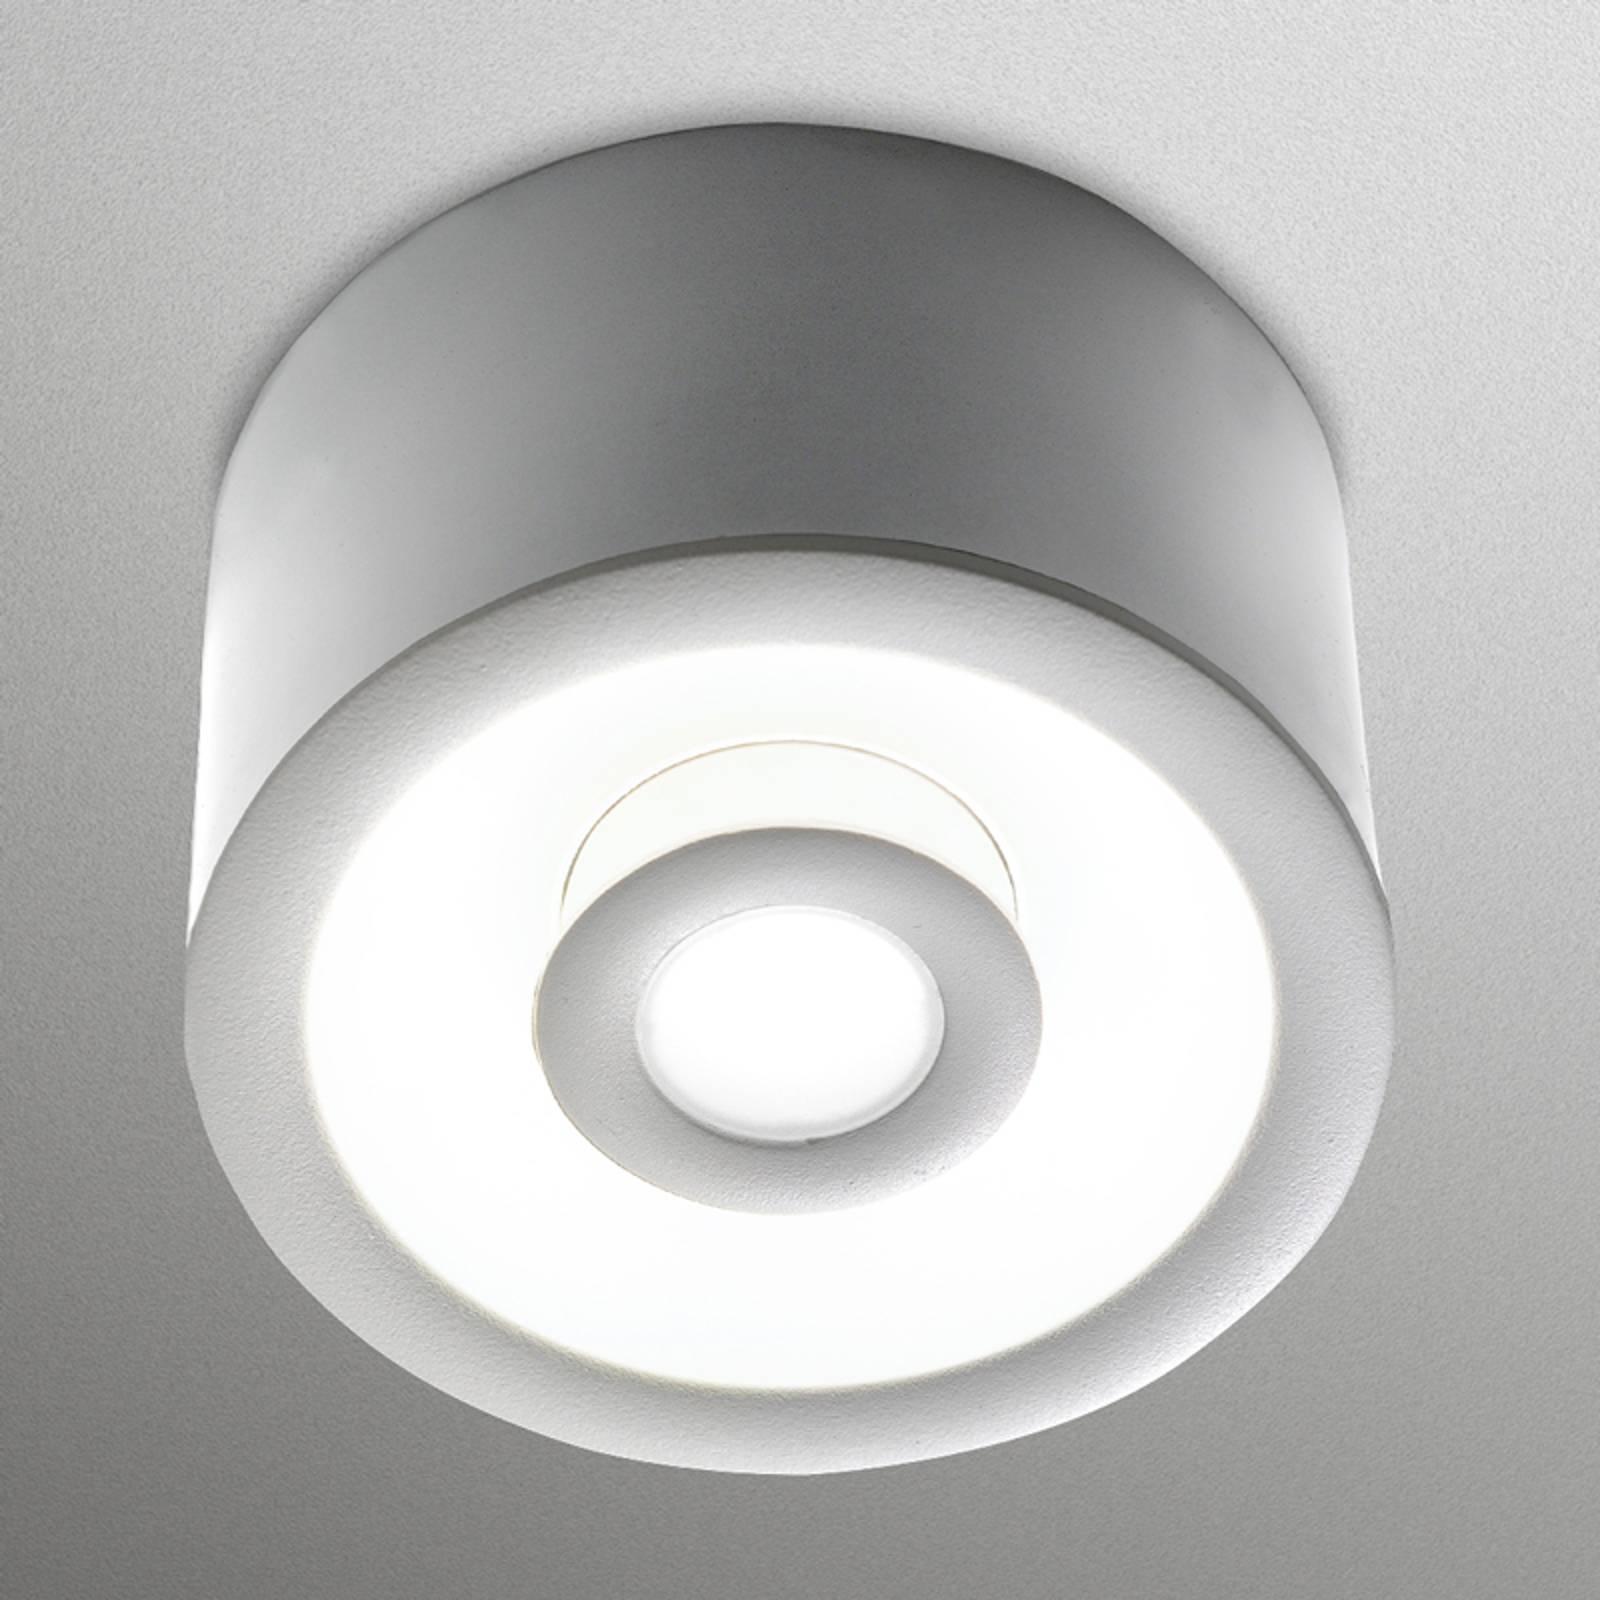 LED plafondlamp Eclipse, innovatieve technologie